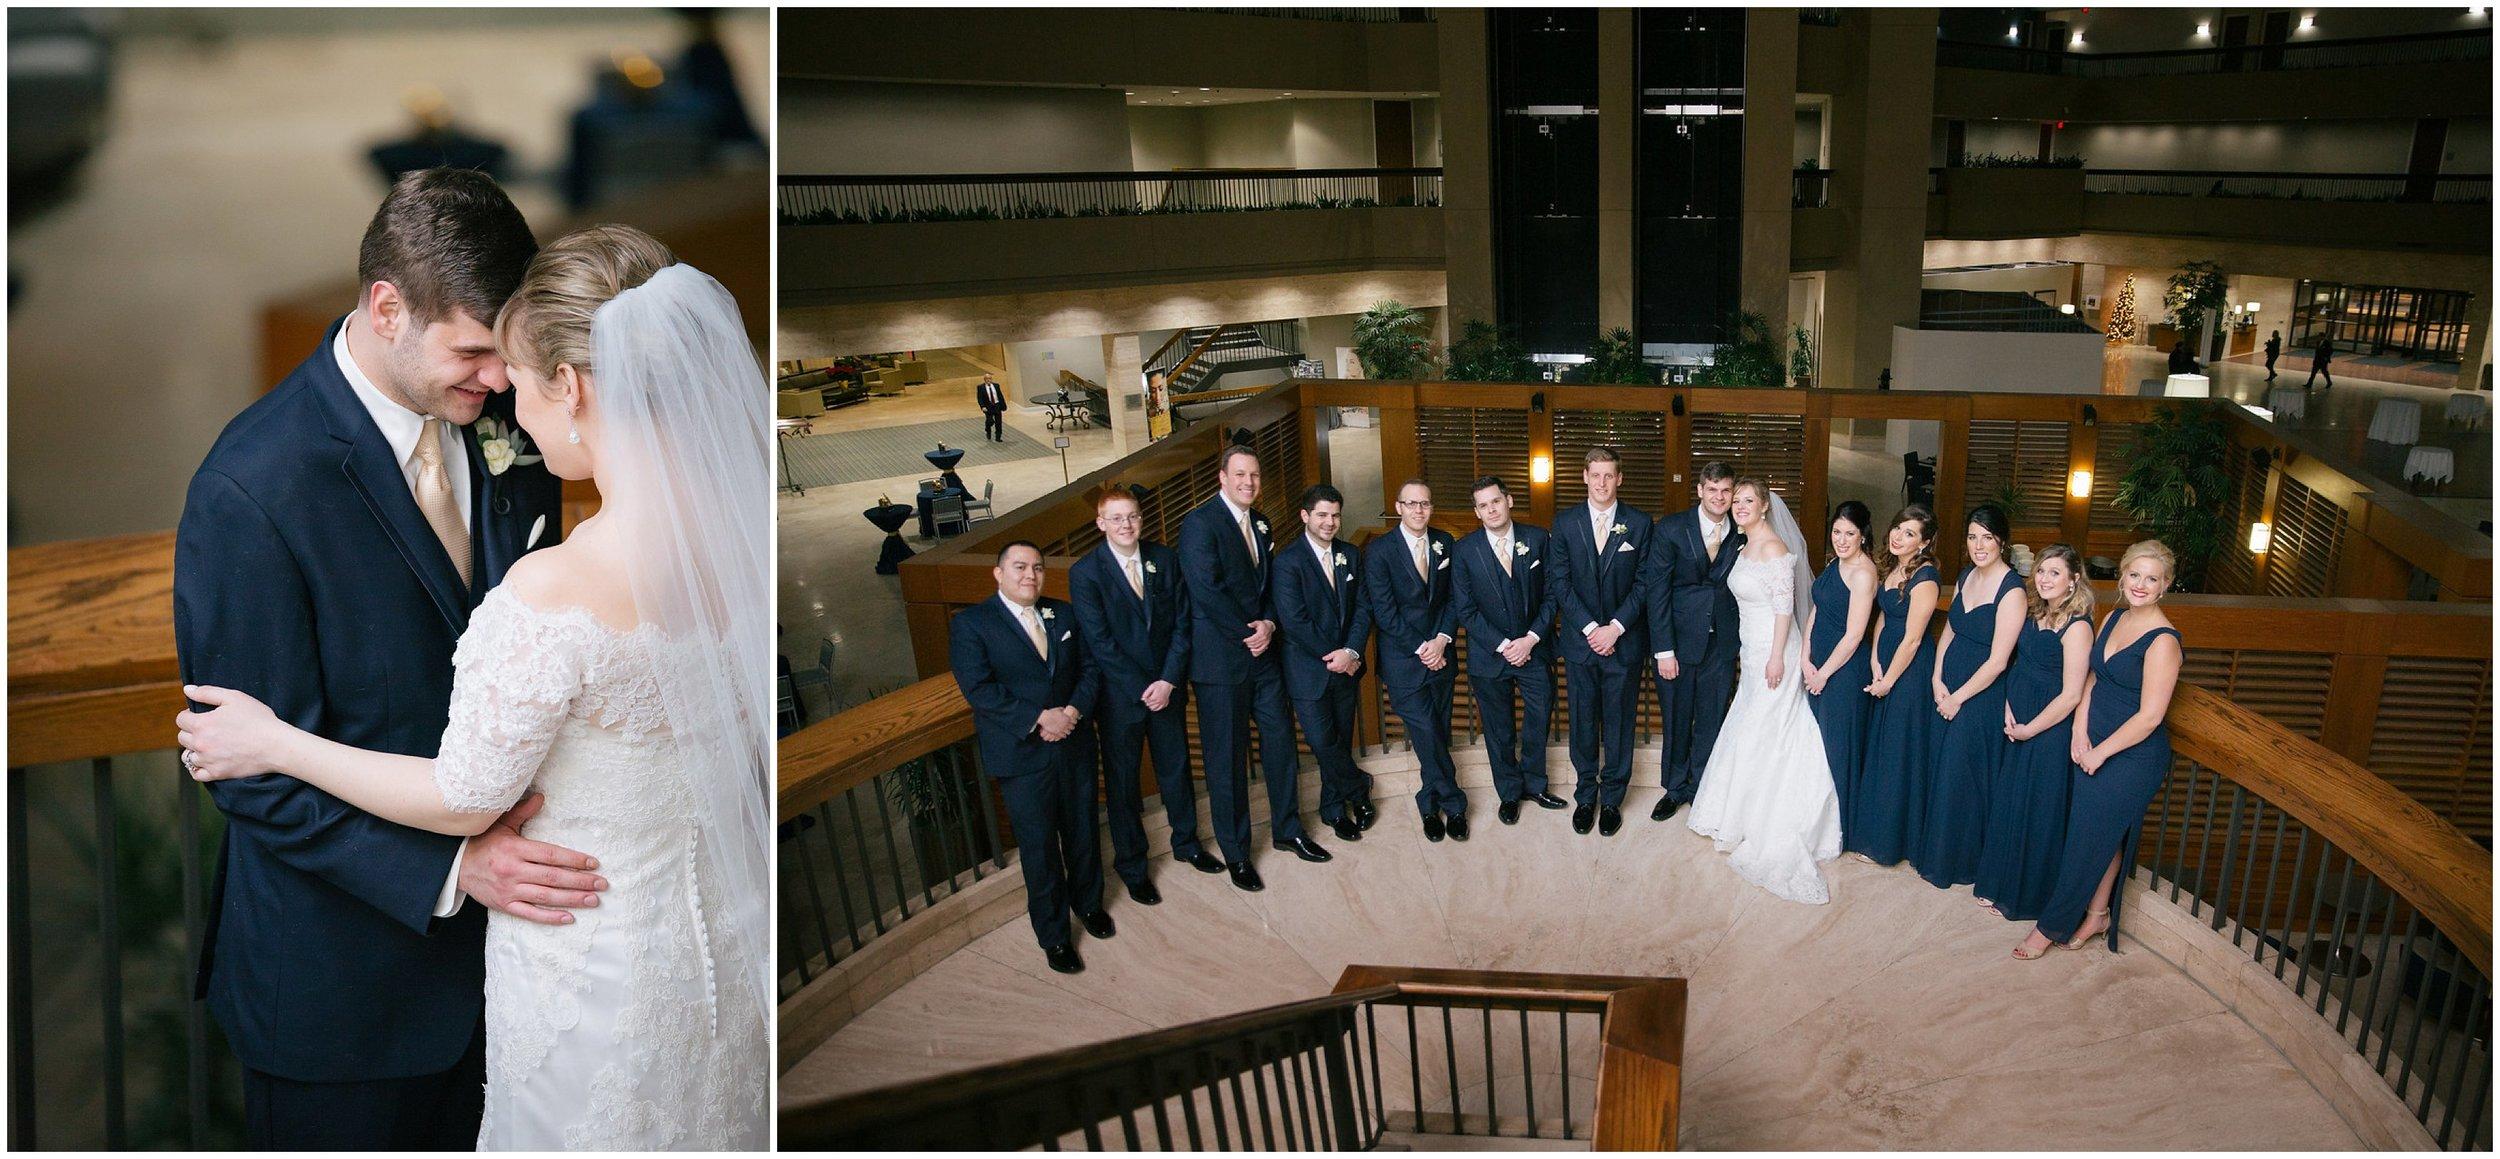 Le Cape Weddings- Chicago Wedding Photography - Sam_and_Josh-281-X3_LuxuryDestinationPhotographer.jpg